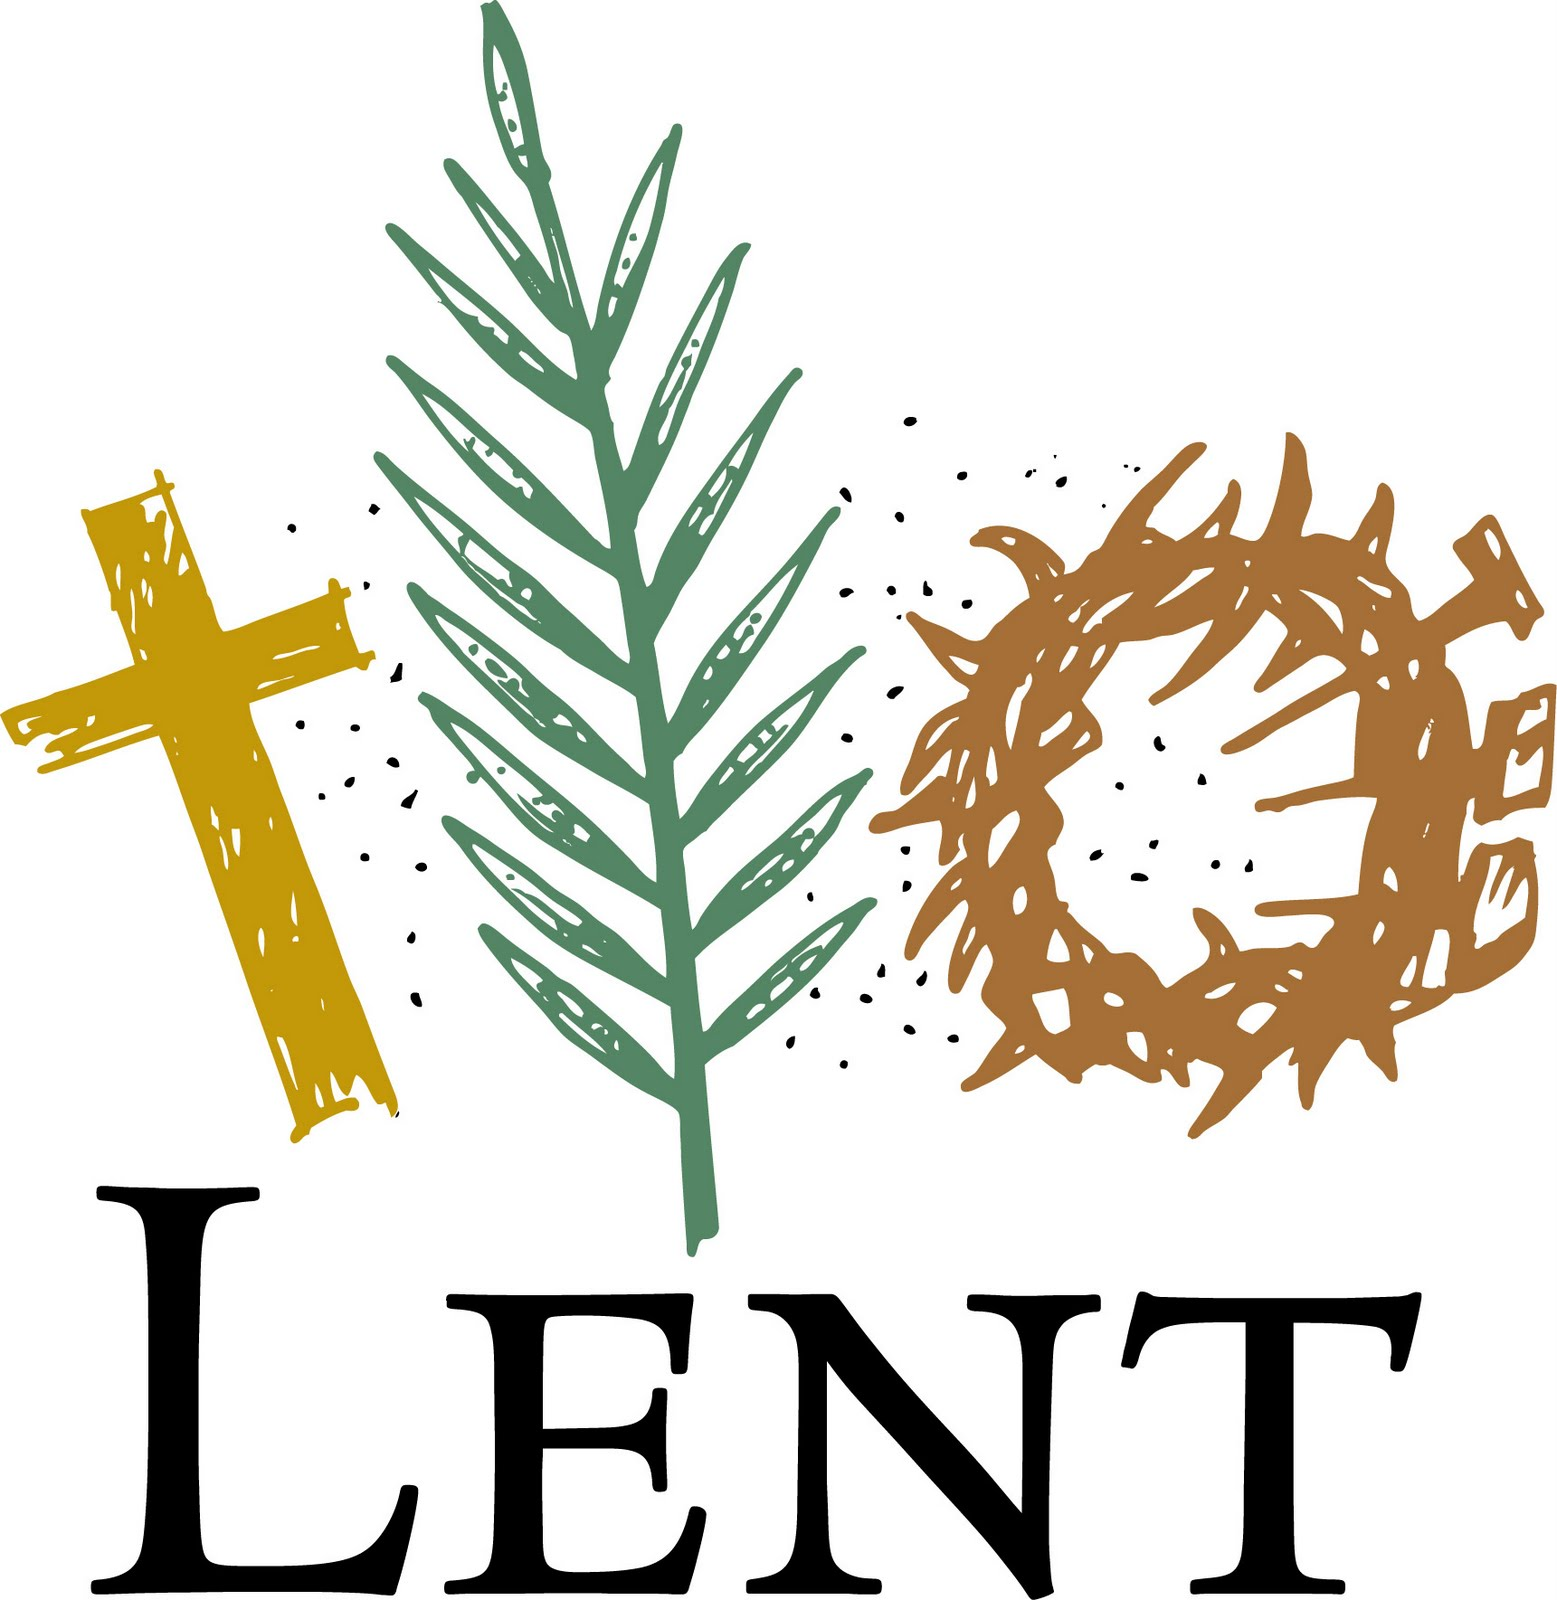 Lent Clip Art Free-Lent Clip Art Free-12